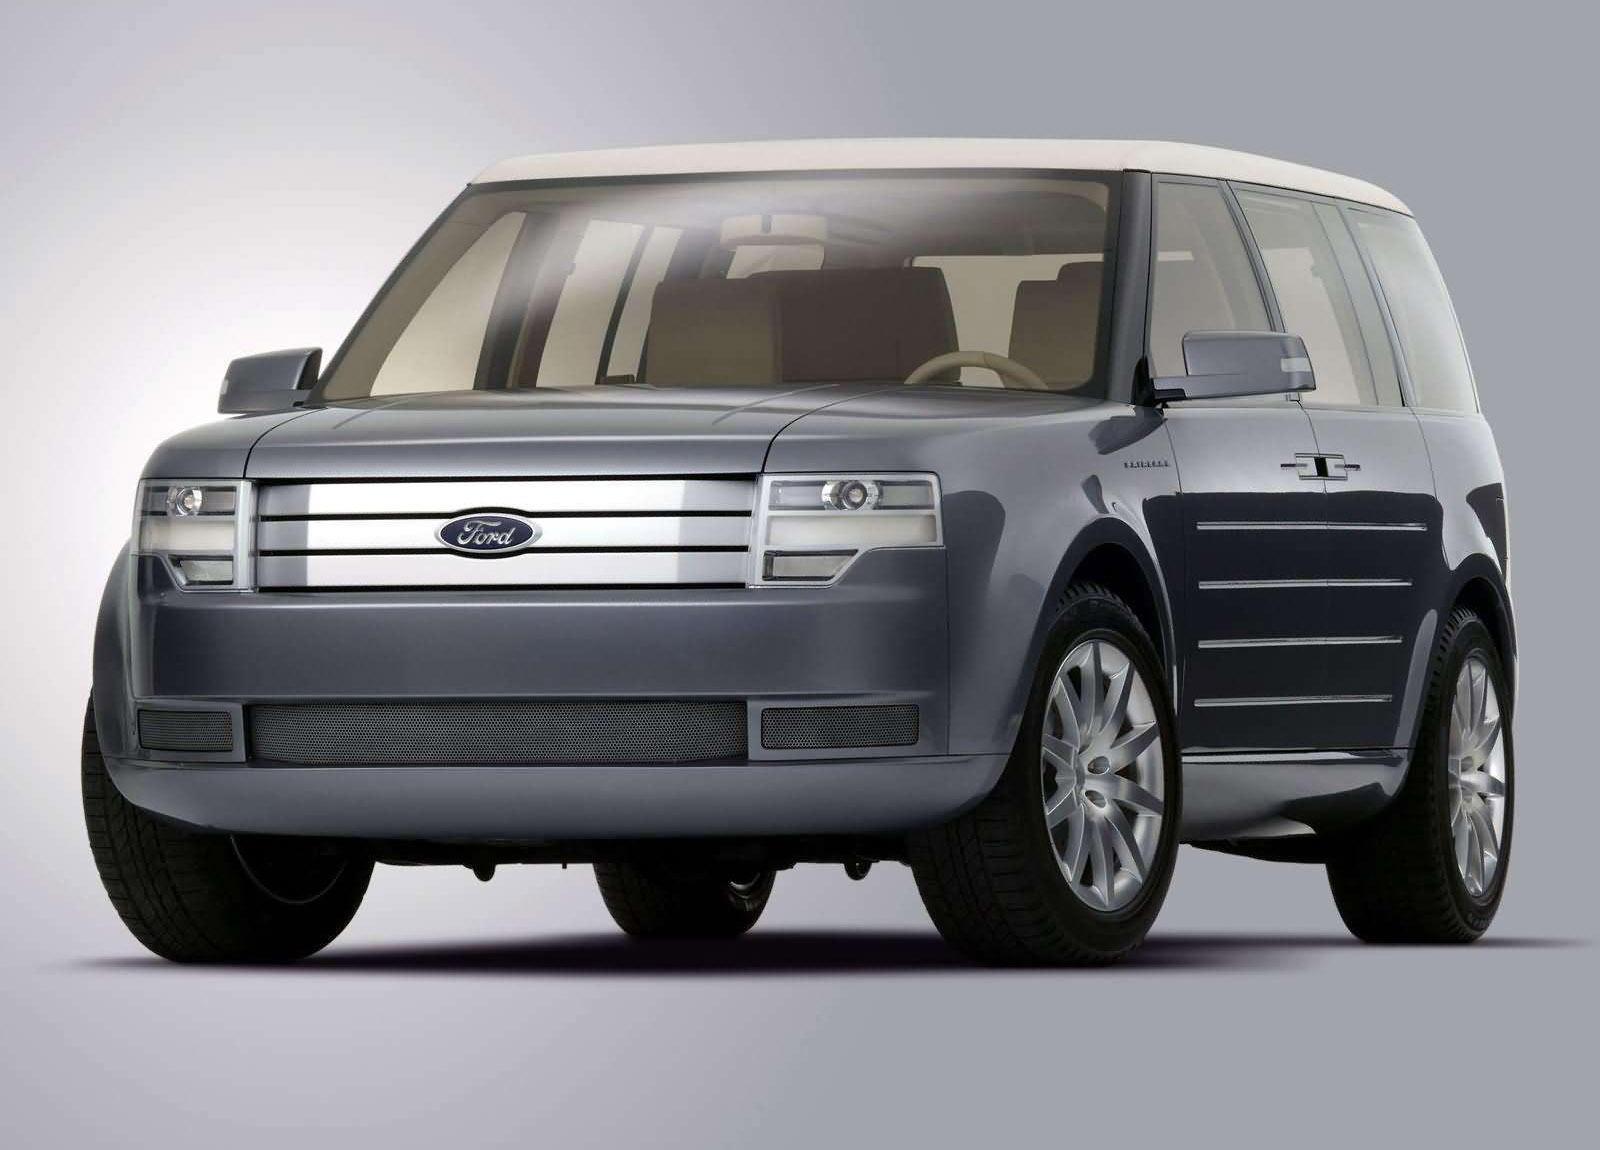 Ford Fairlane Concept photo #1